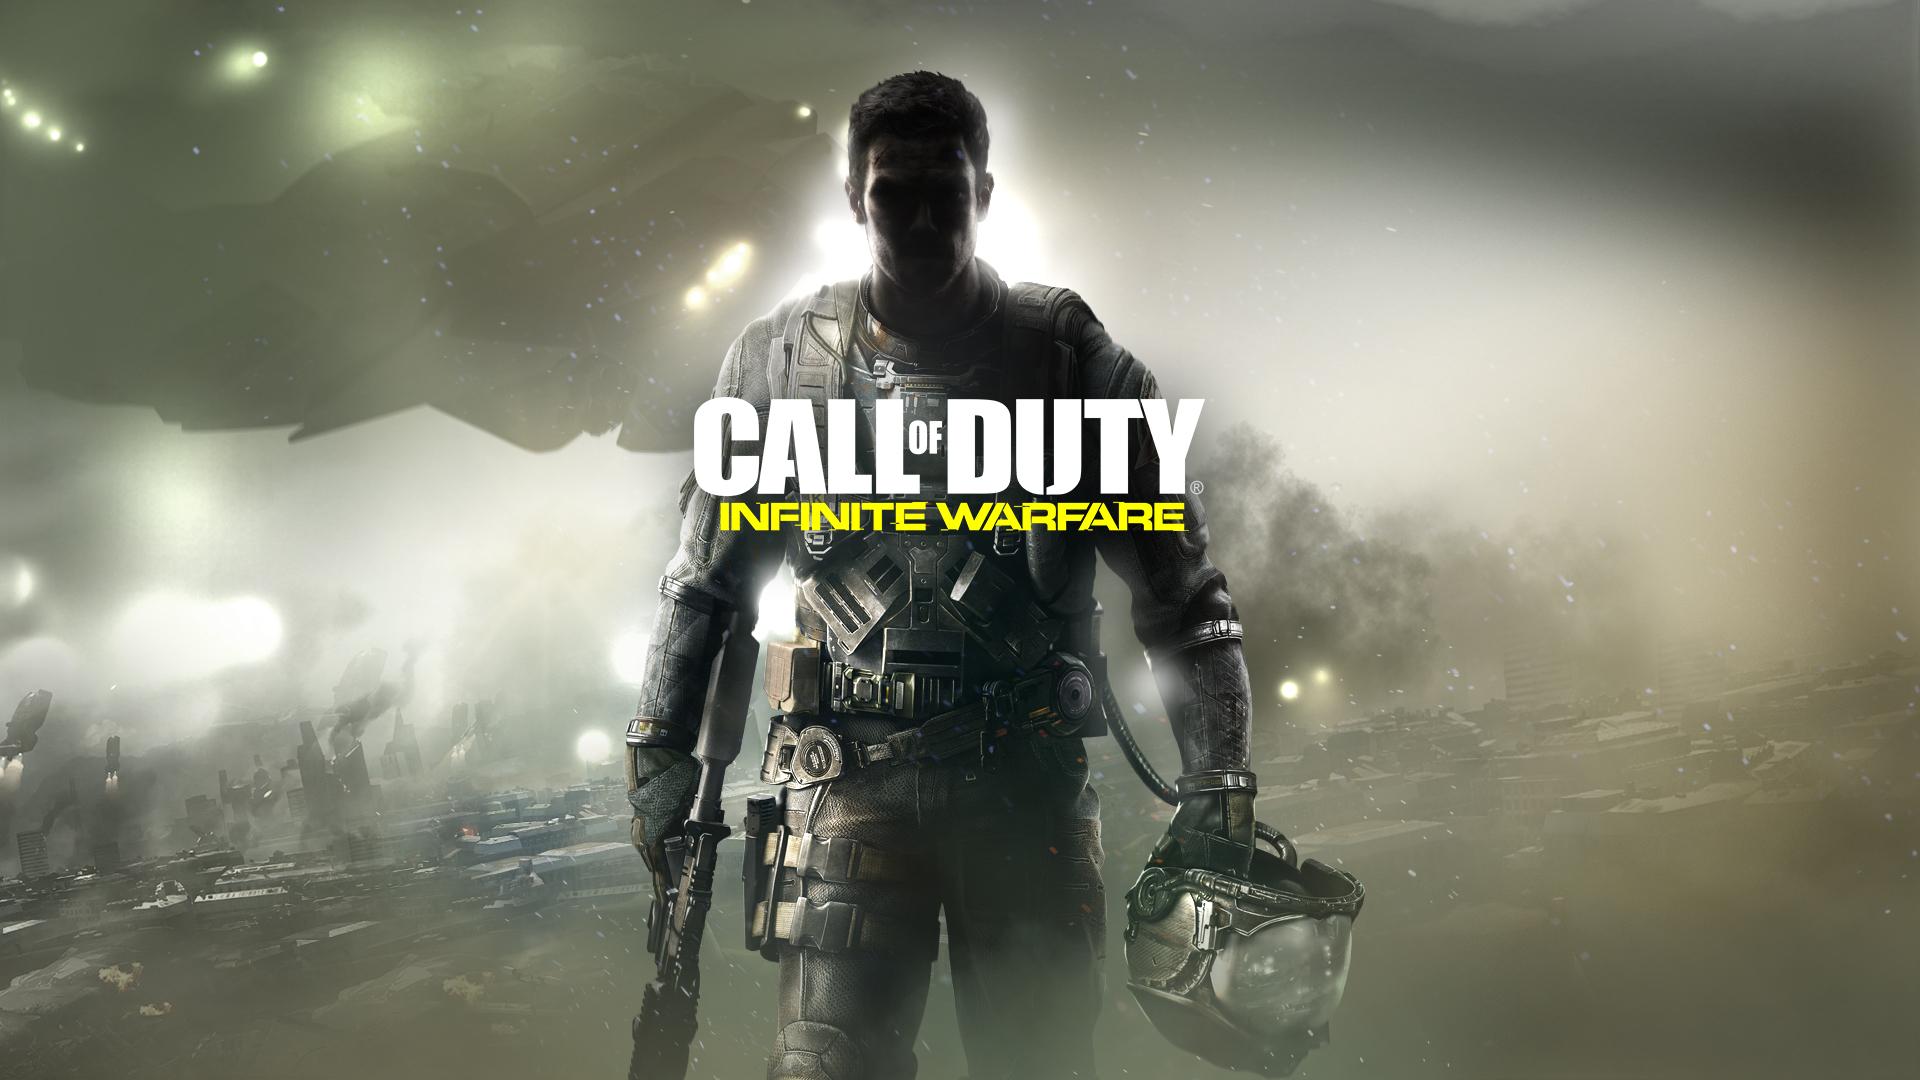 [mmoga.de] Call of Duty Infinite Warfare Day One Edition - Steam Key